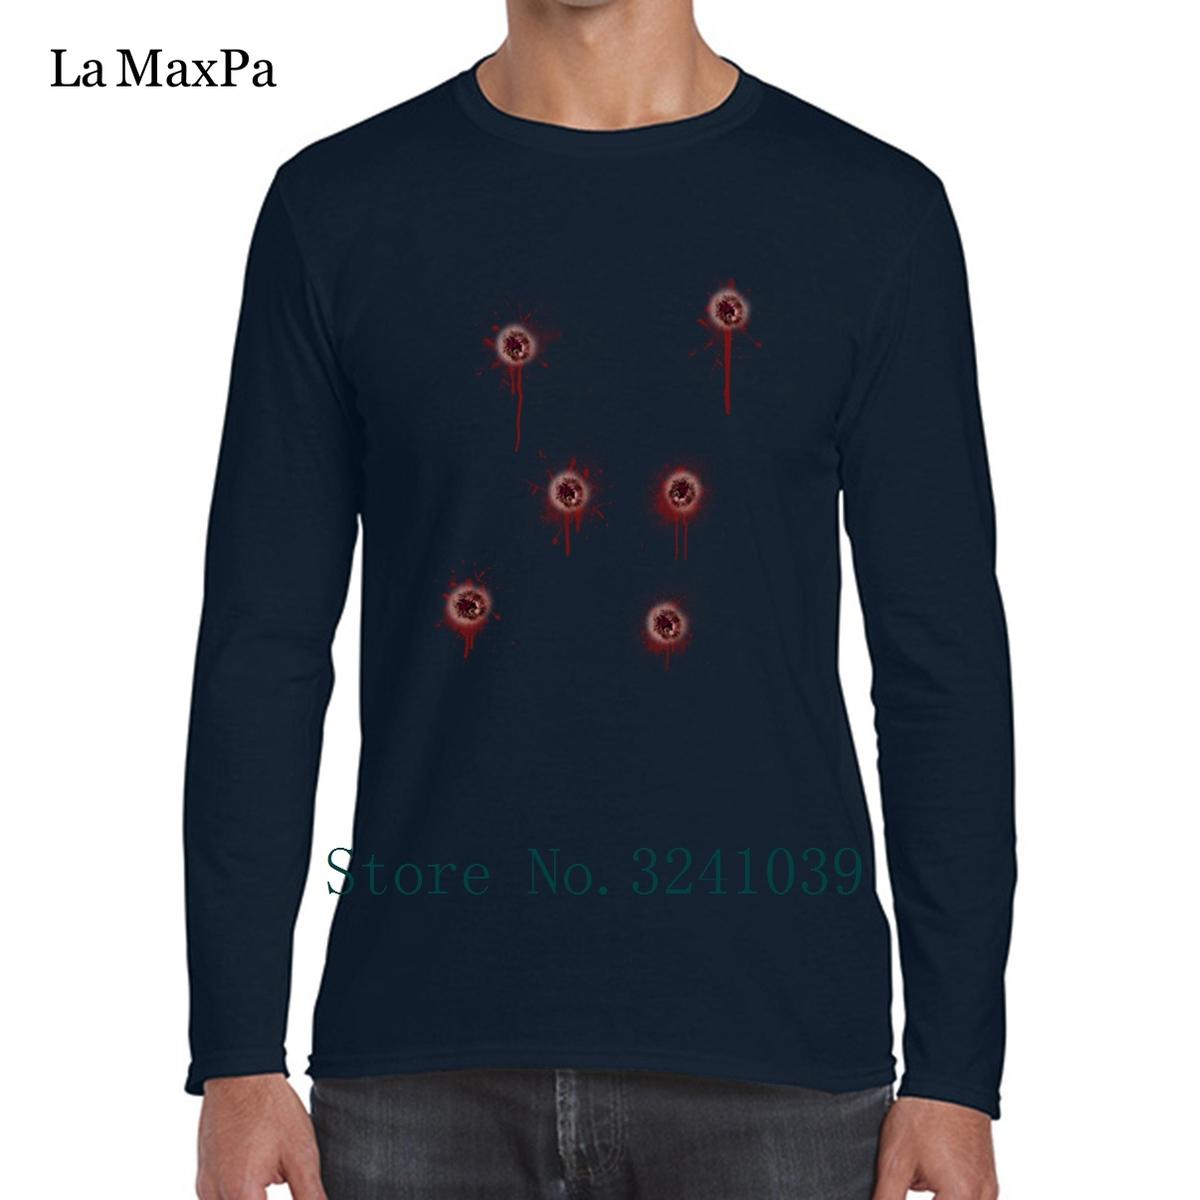 La Maxpa Best Bullet Holes Costume Tee Shirts For Men Kawaii Regular T-Shirt Sunlight long sleeve S-3xl Unisex Men's T Shirt